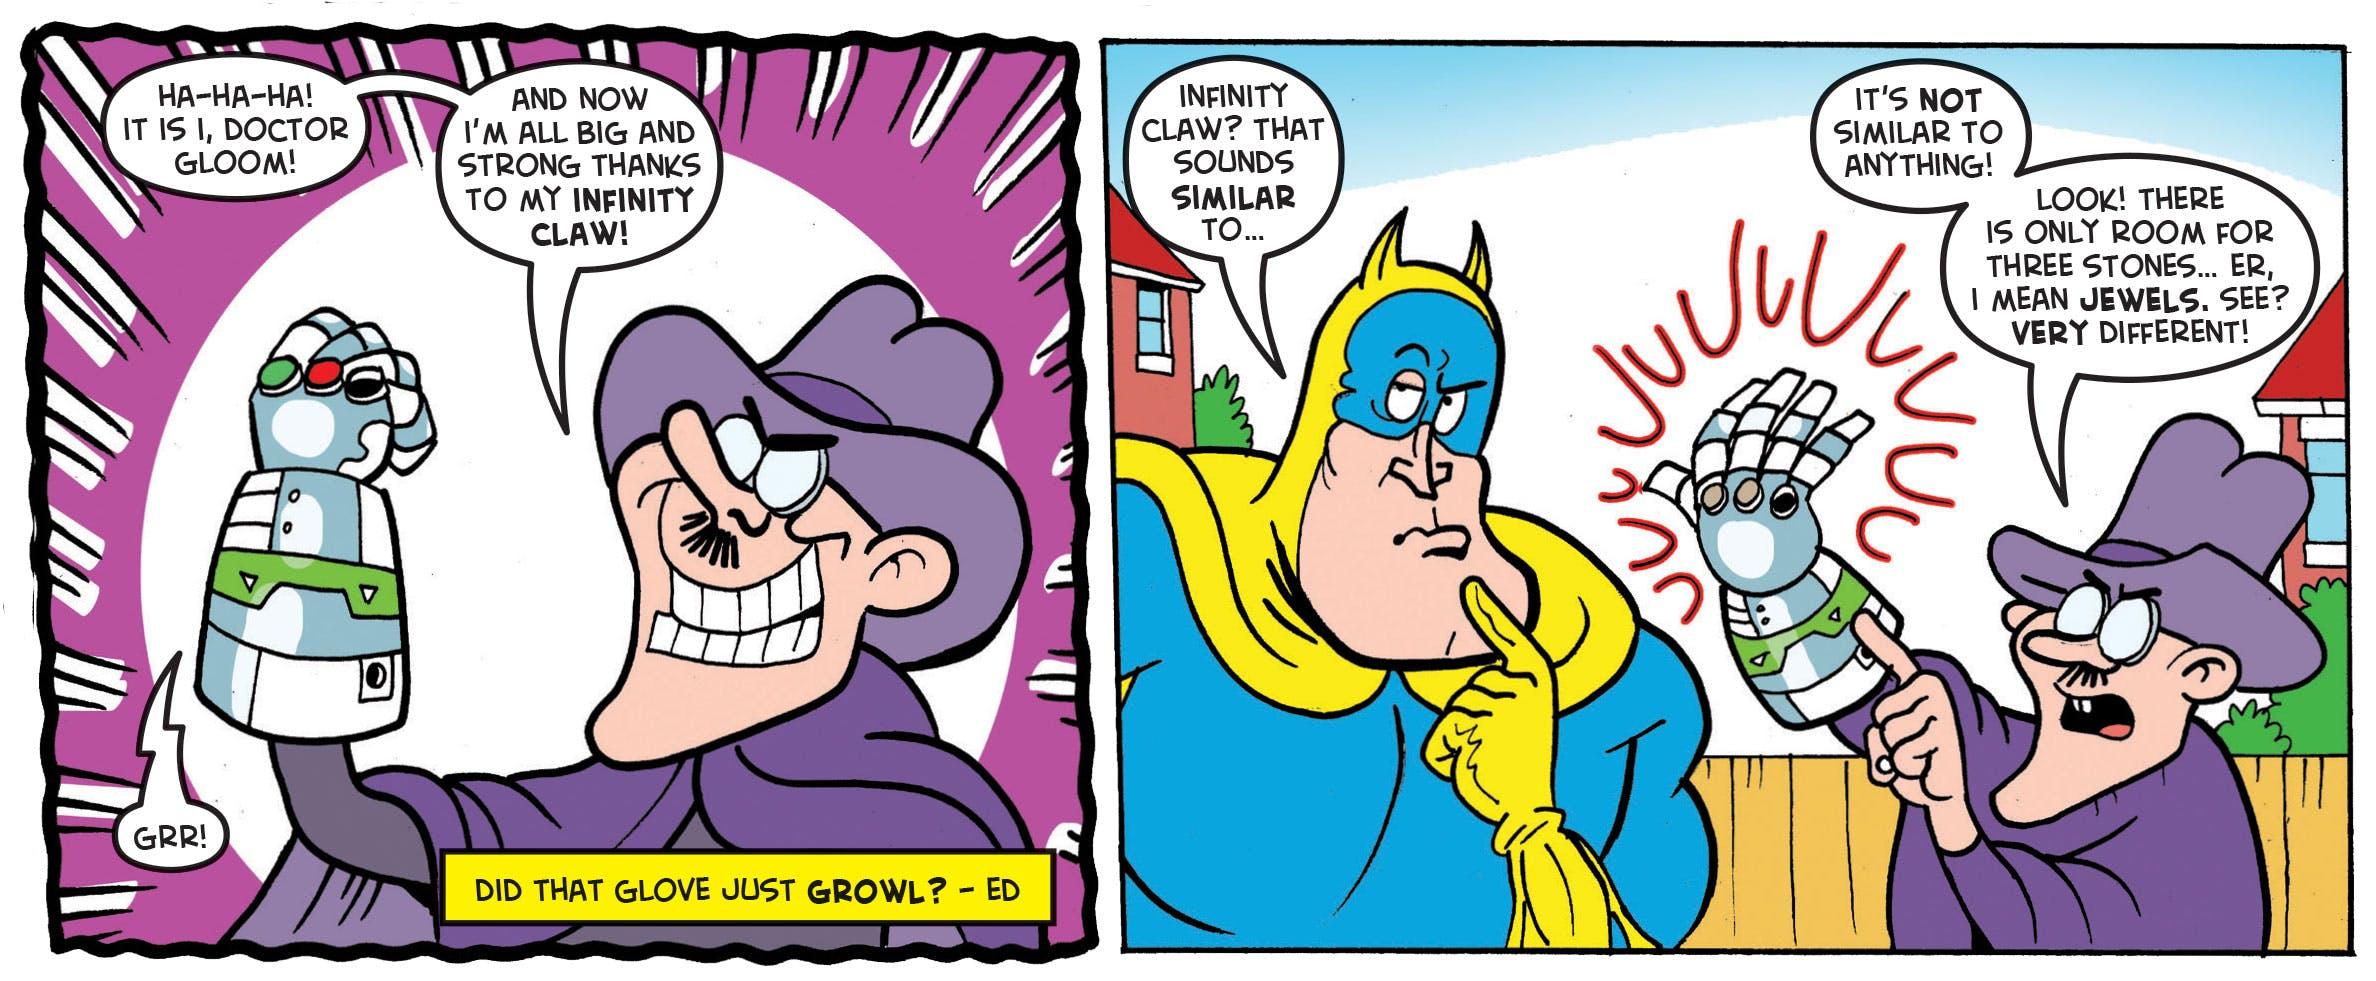 Bananaman infinity claw